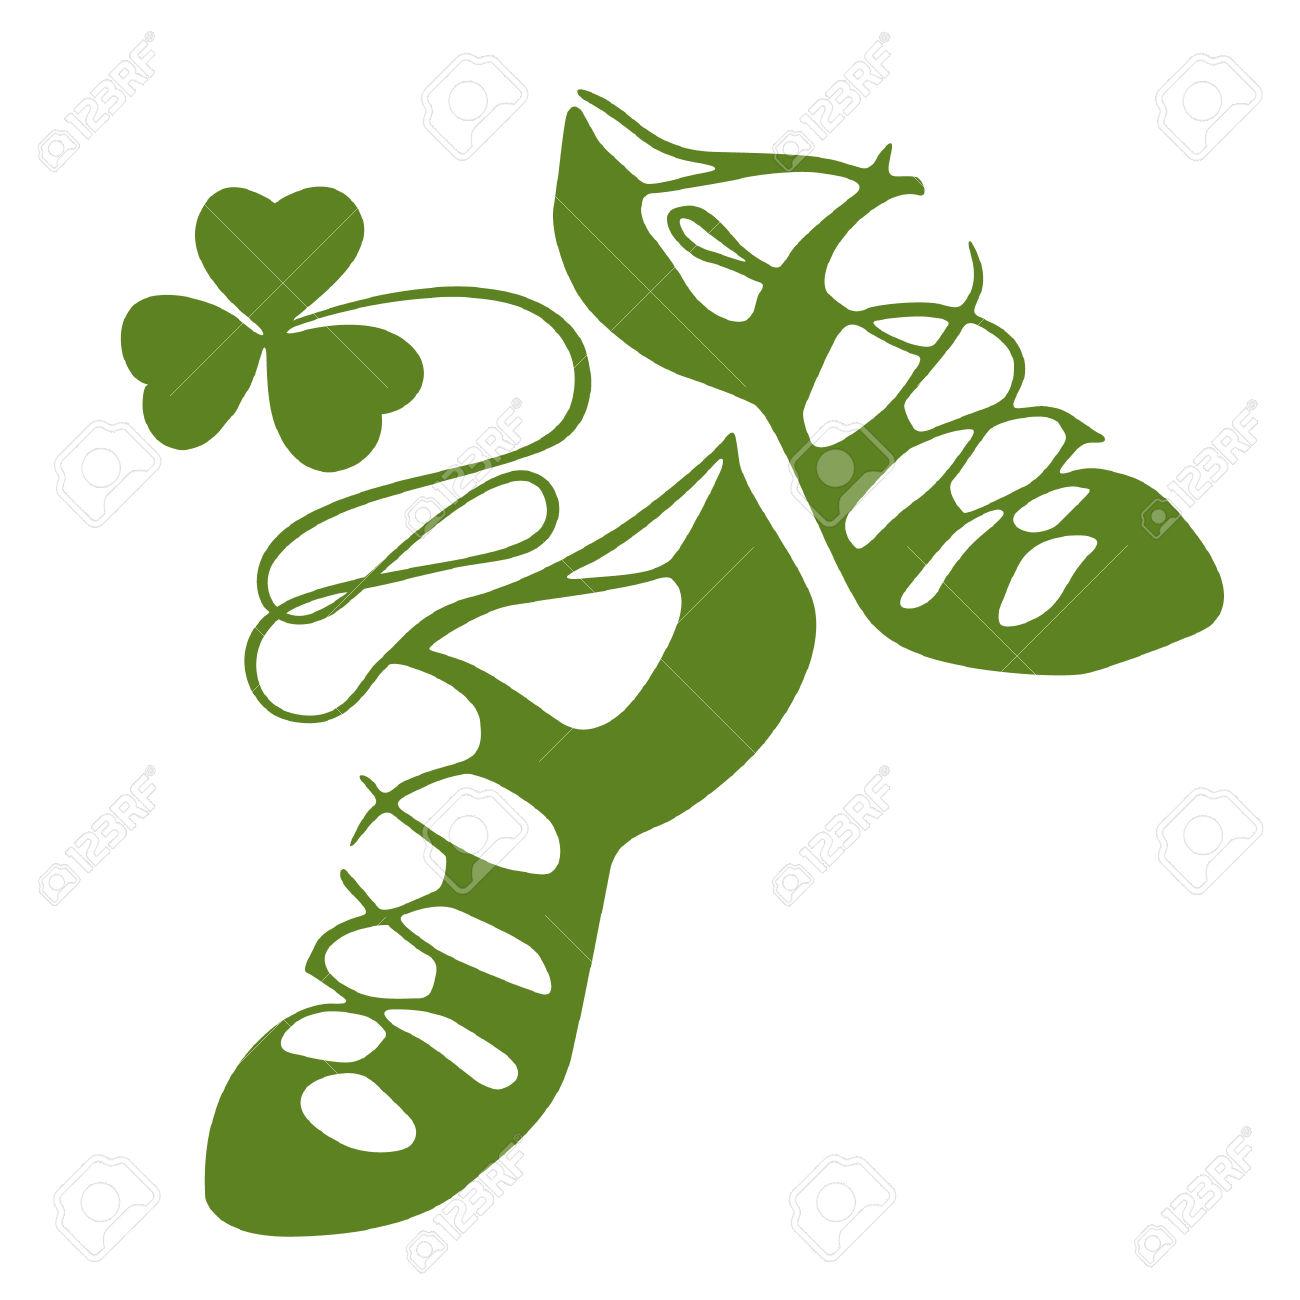 1300x1300 Irish Dancing Shoes Clipart Amp Irish Dancing Shoes Clip Art Images